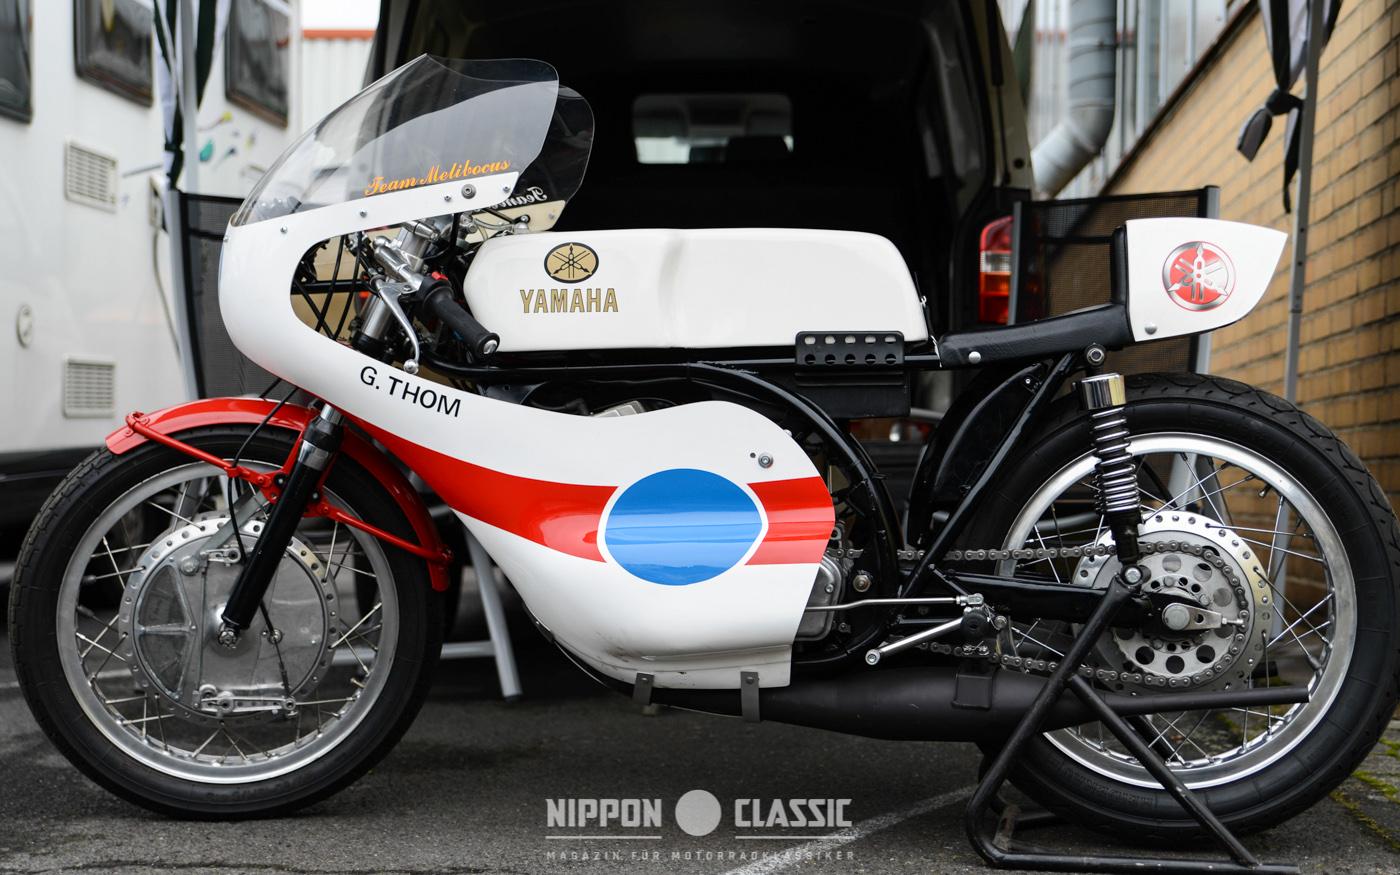 Yamaha TR2 348 ccm Bj. 1969